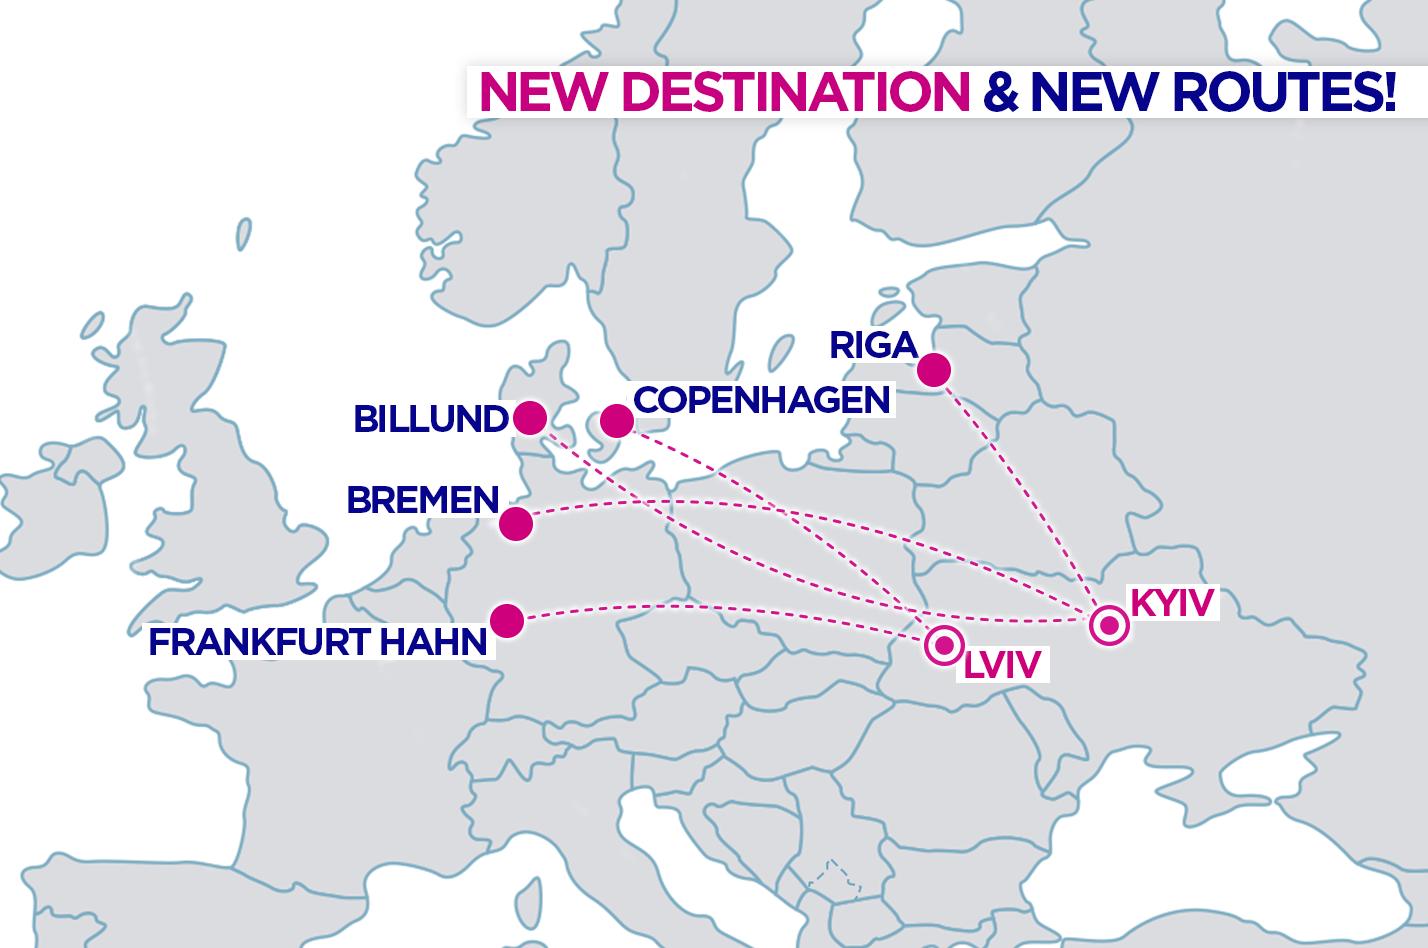 Карта новых маршрутов Wizz Air из Украины